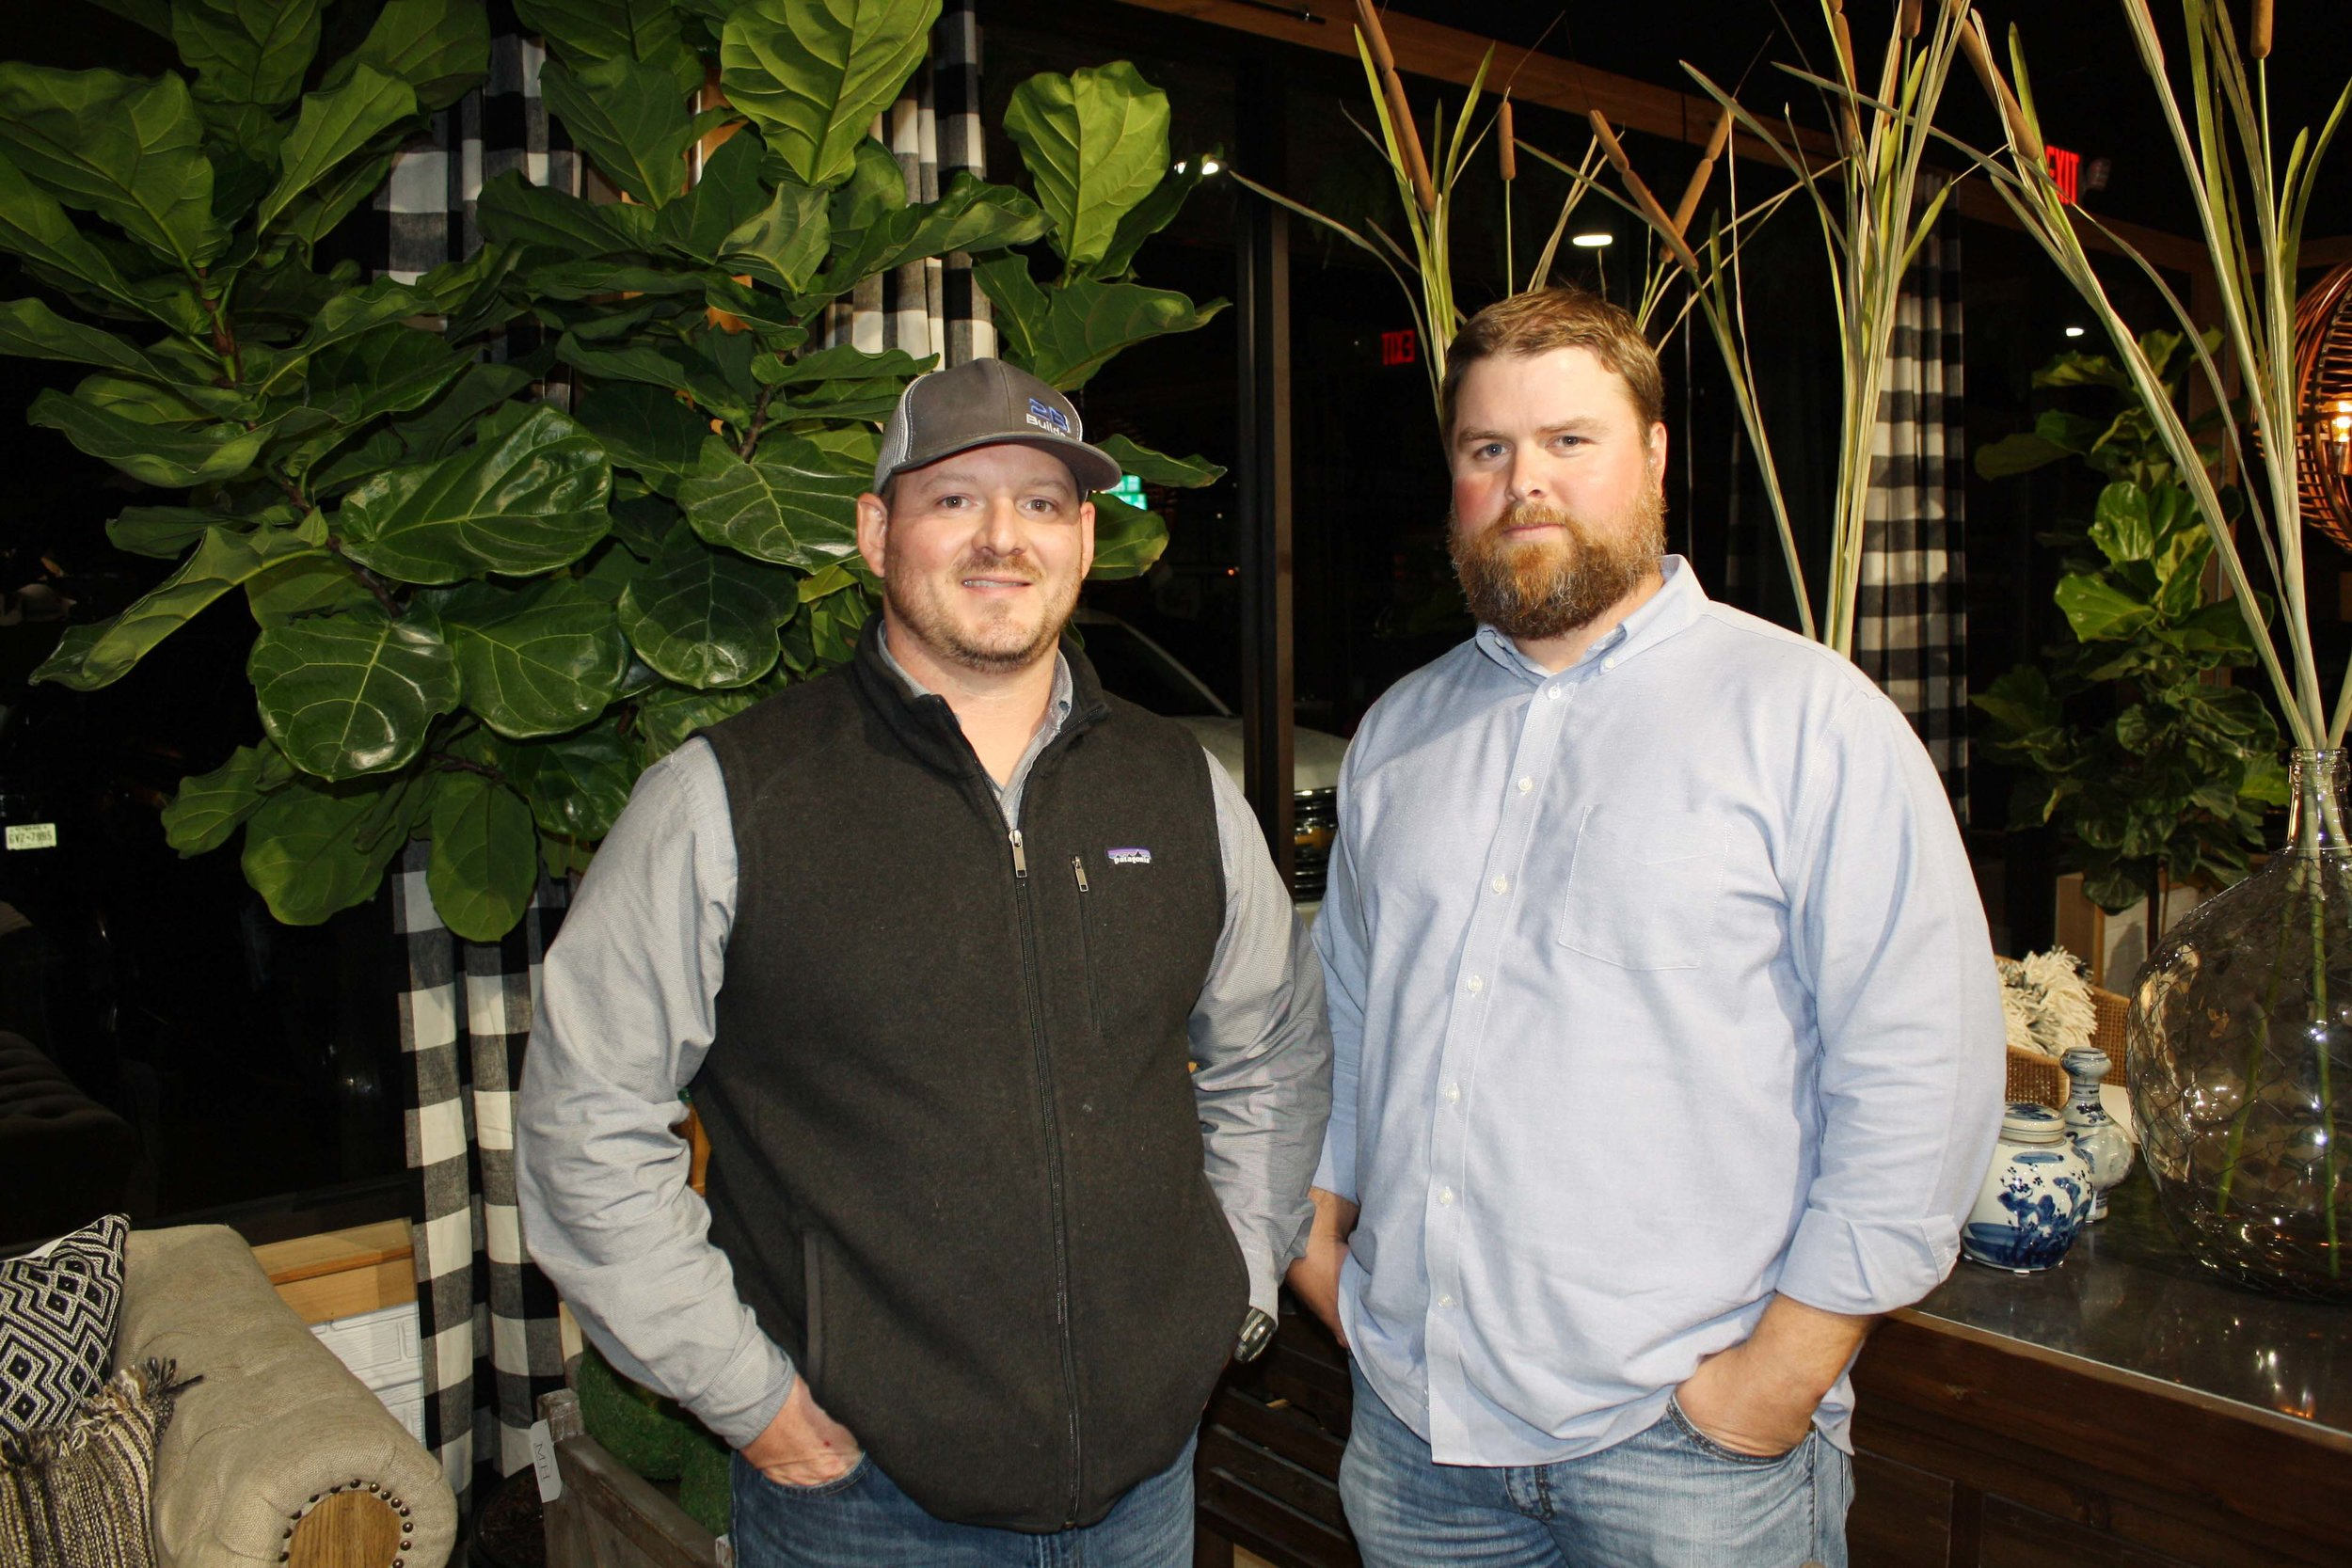 Brandon Taylor and Brad Meador